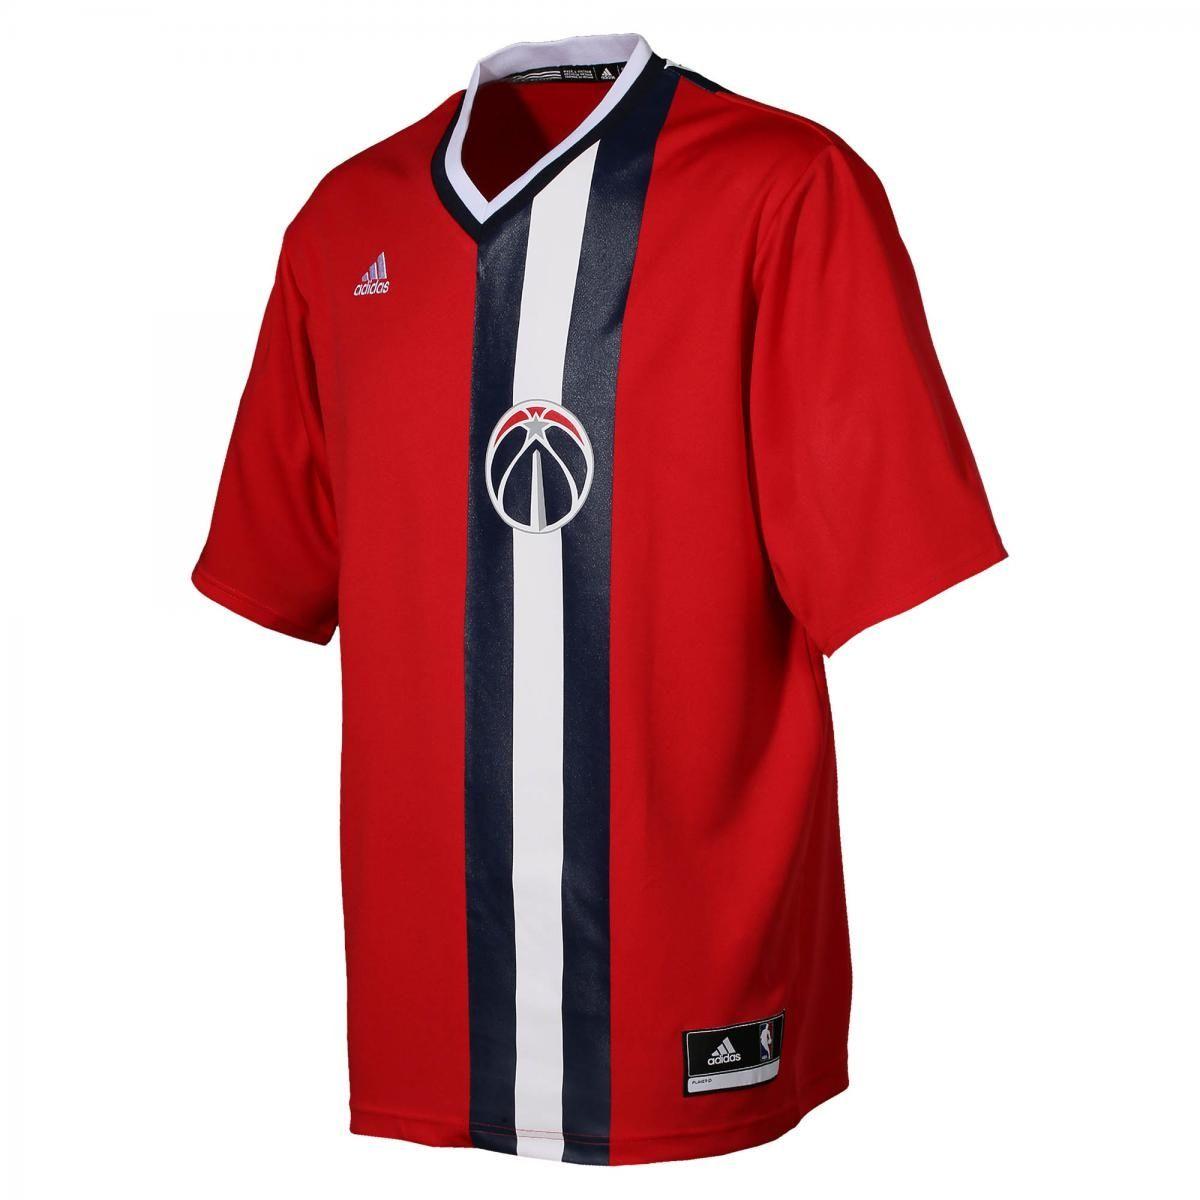 reputable site c8546 e221b Type Shirts adidas NBA Washington Wizards Replica Jersey